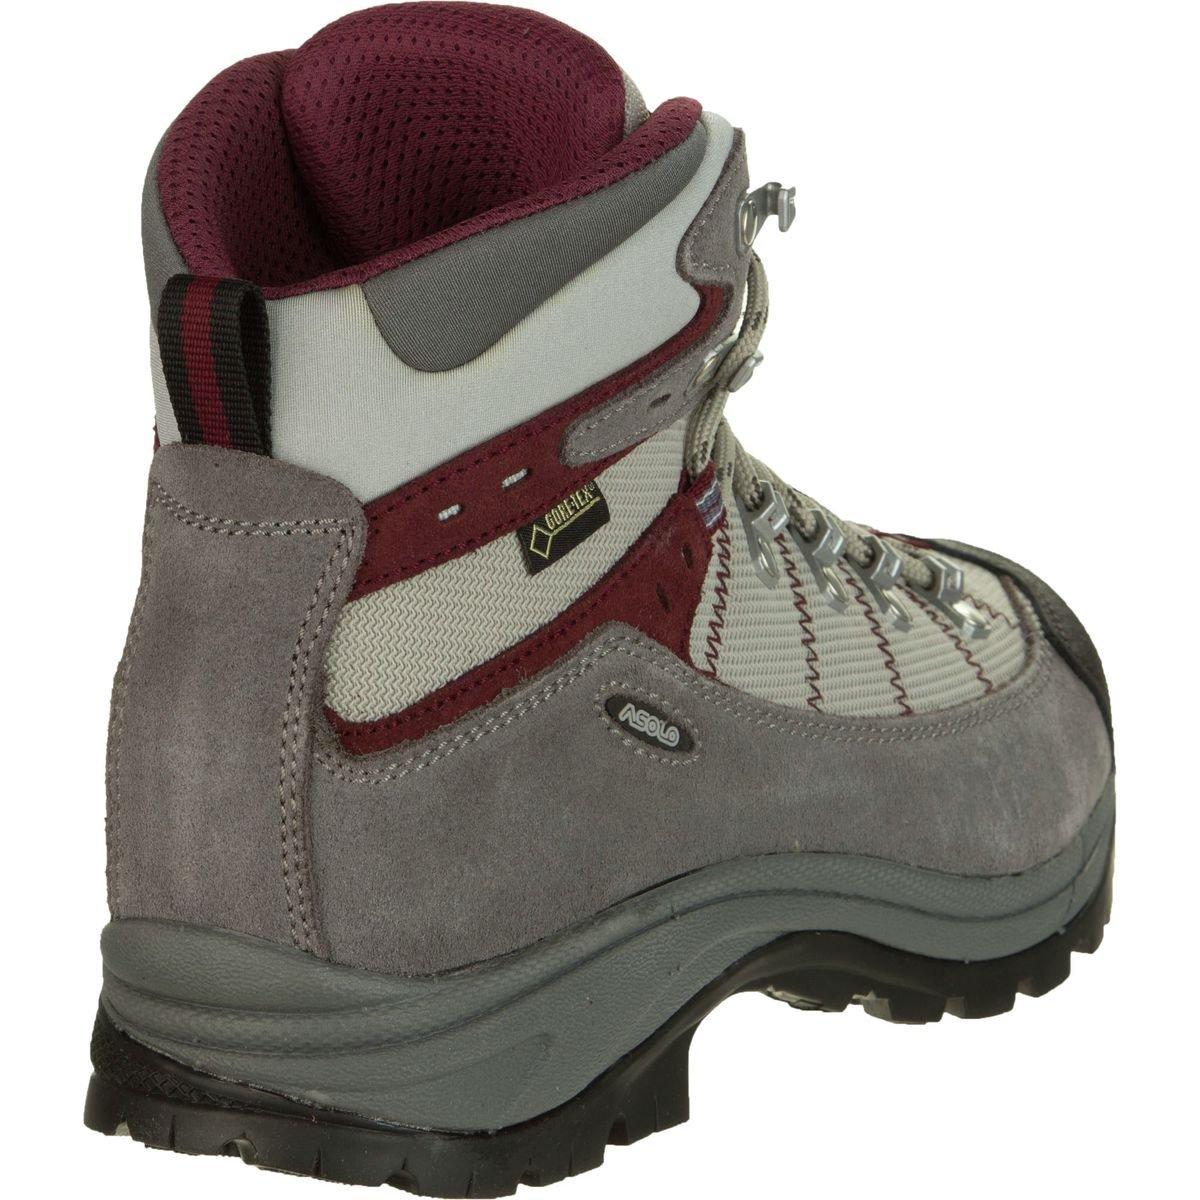 Asolo Women's Revert GV Hiking Boot B00DWWDGR2 8 B(M) US|Donkey/Grey